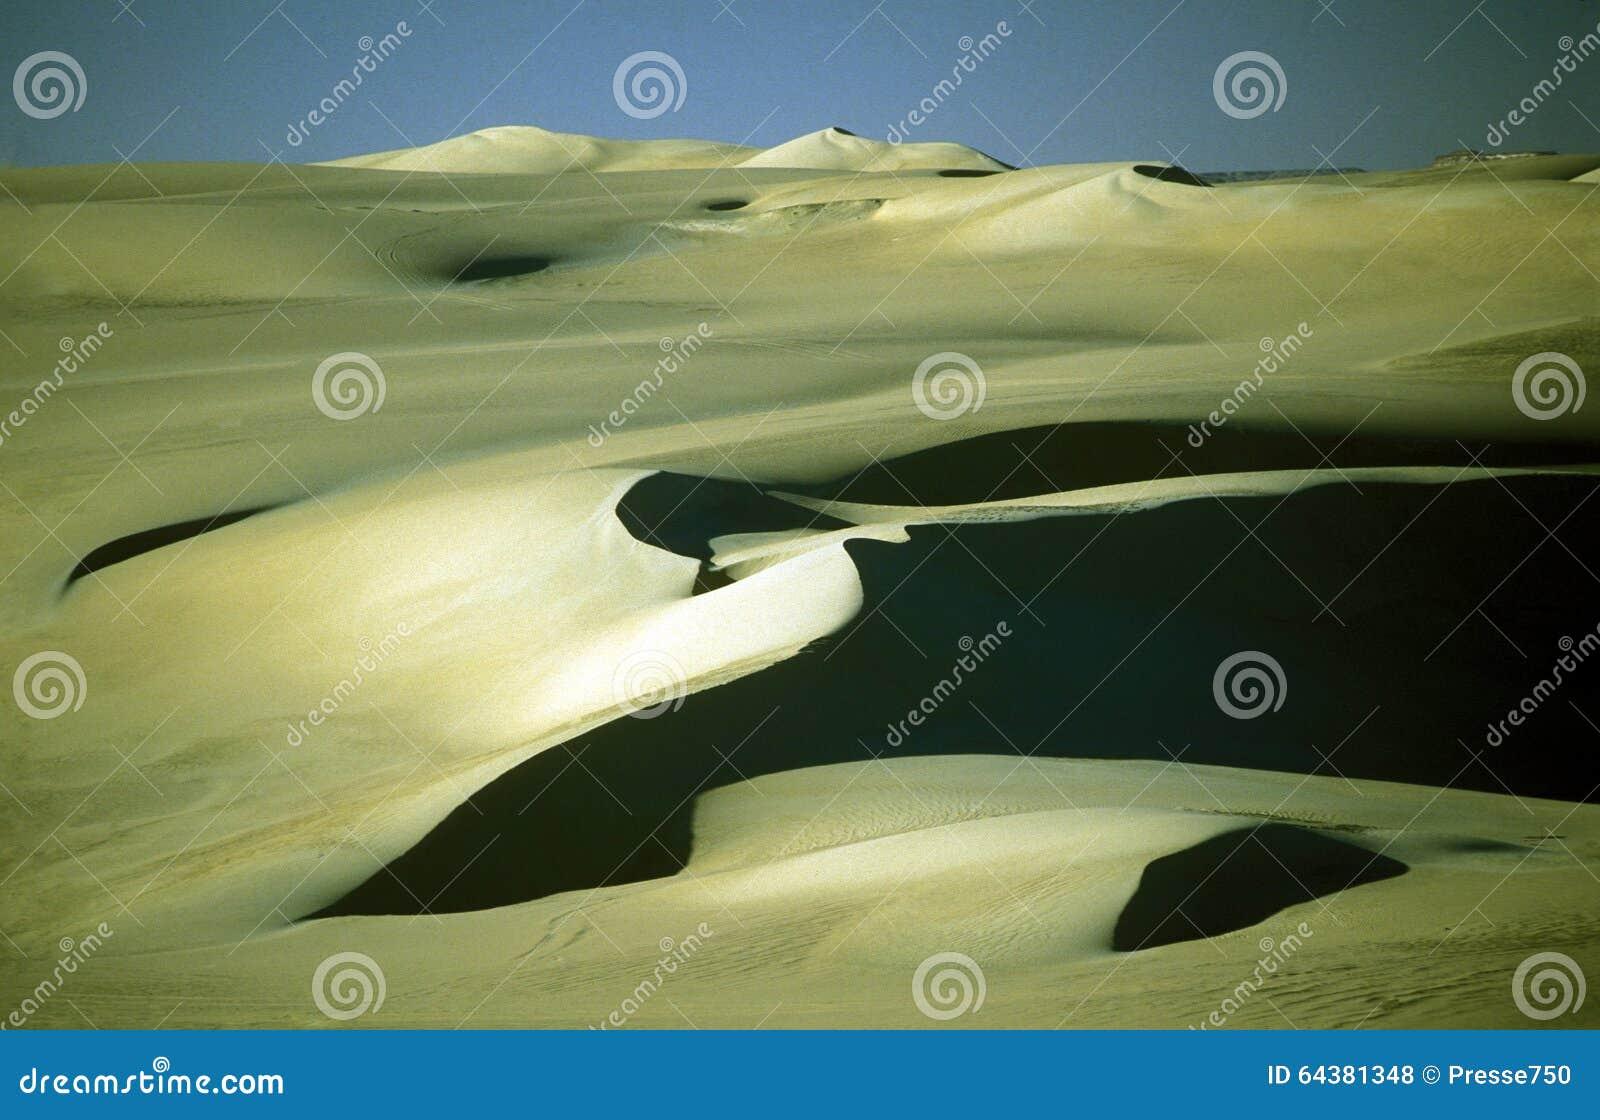 AFRICA EGYPT SAHARA SIWA DESERT